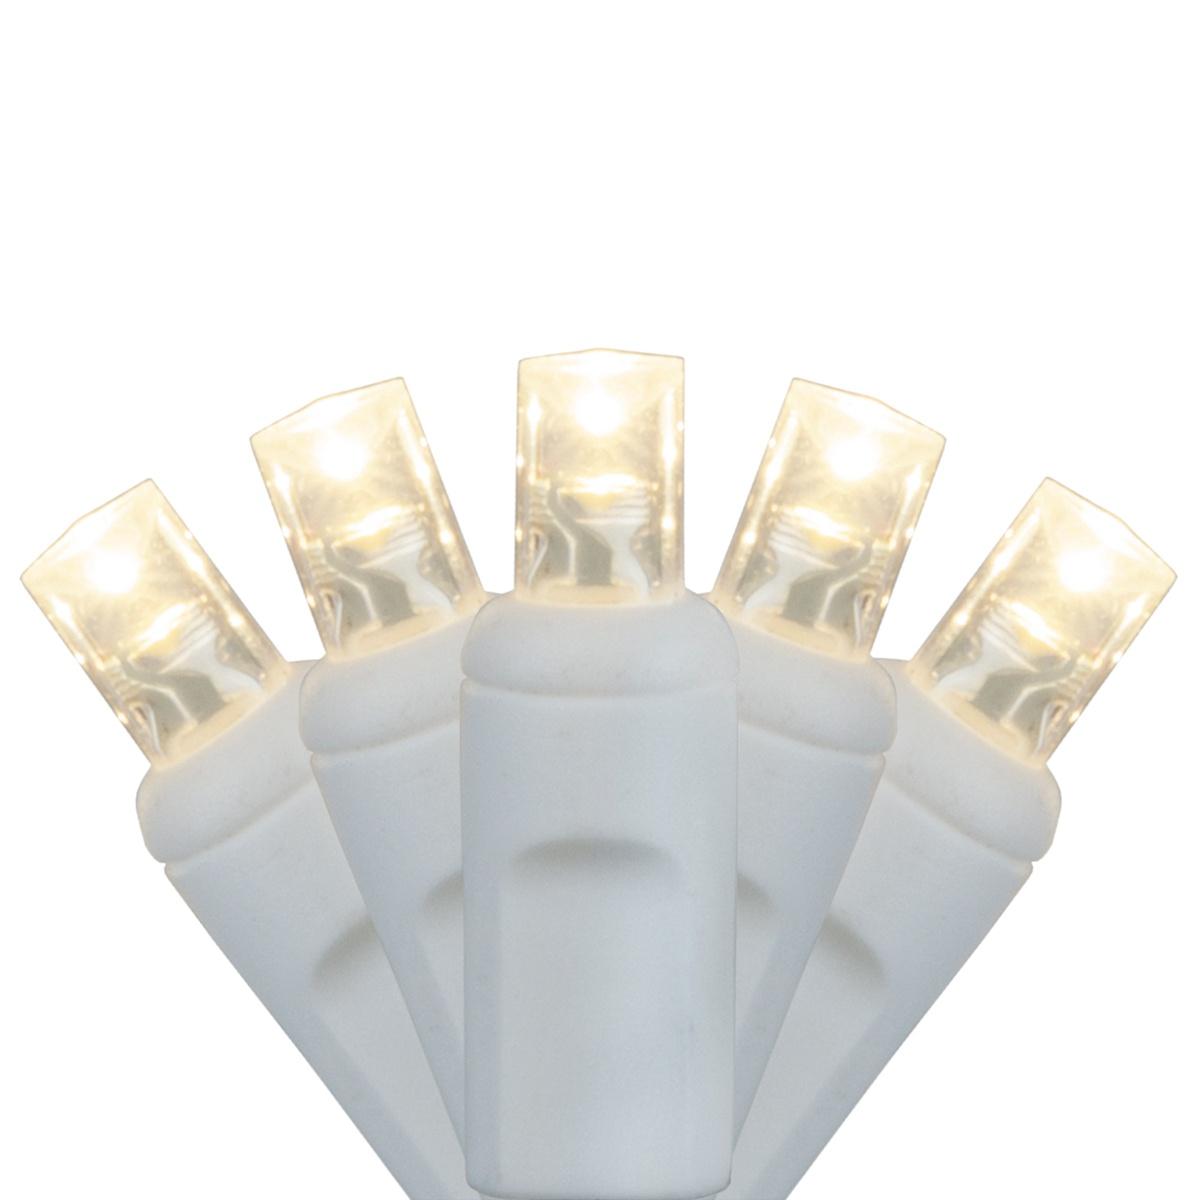 Wide Angle 5MM LED Lights 70 5mm Warm White LED